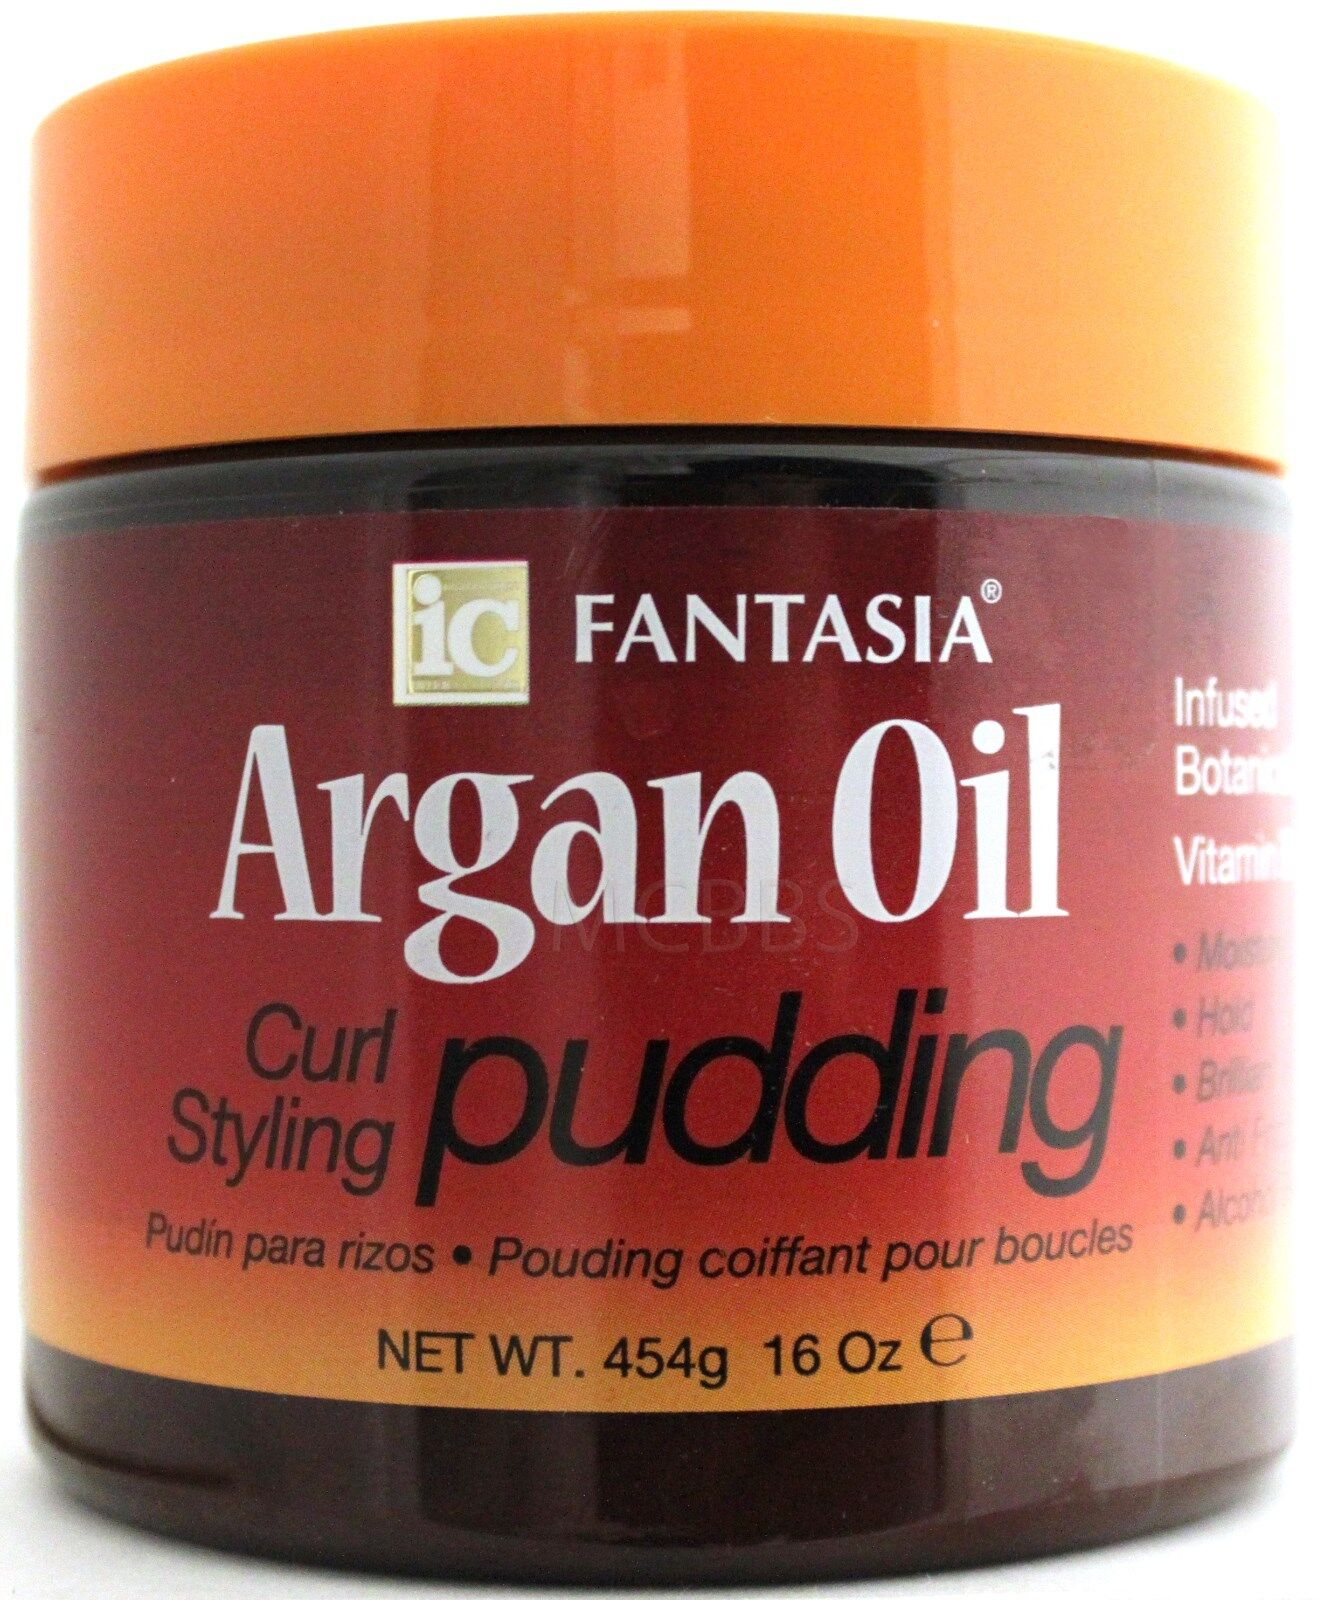 FANTASIA IC ARGAN OIL CURL STYLING HAIR PUDDING VITAMINS